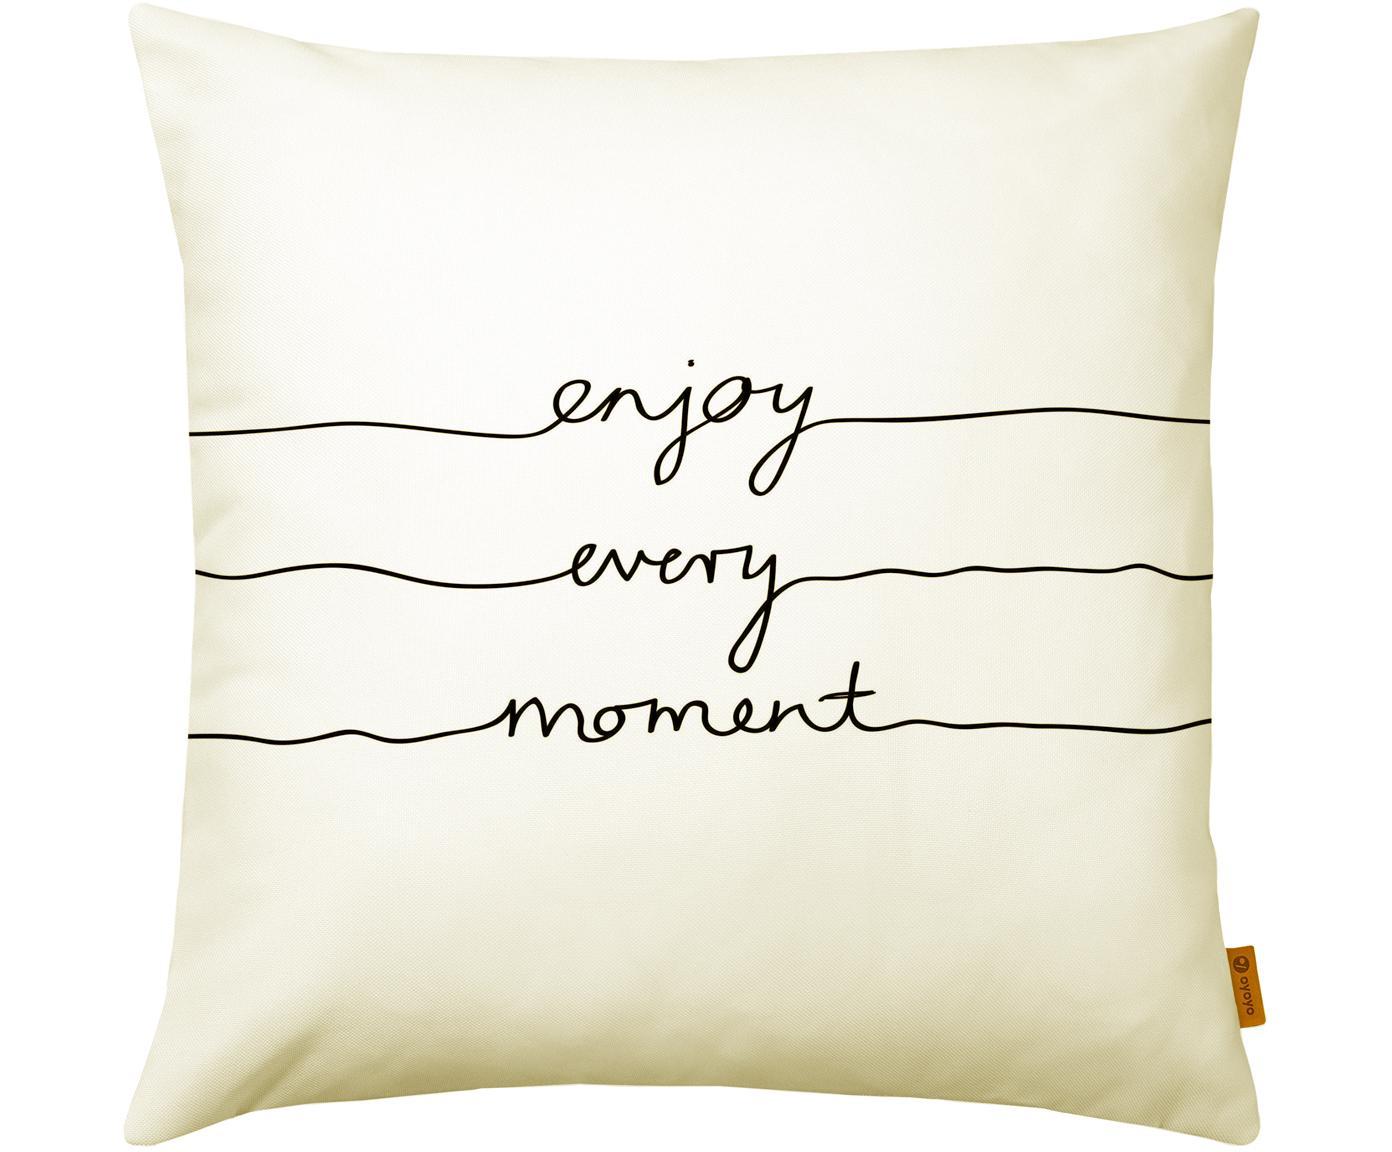 Federa Enjoy Every Moment con scritta in nero/bianco, Poliestere, Bianco, nero, Larg. 40 x Lung. 40 cm